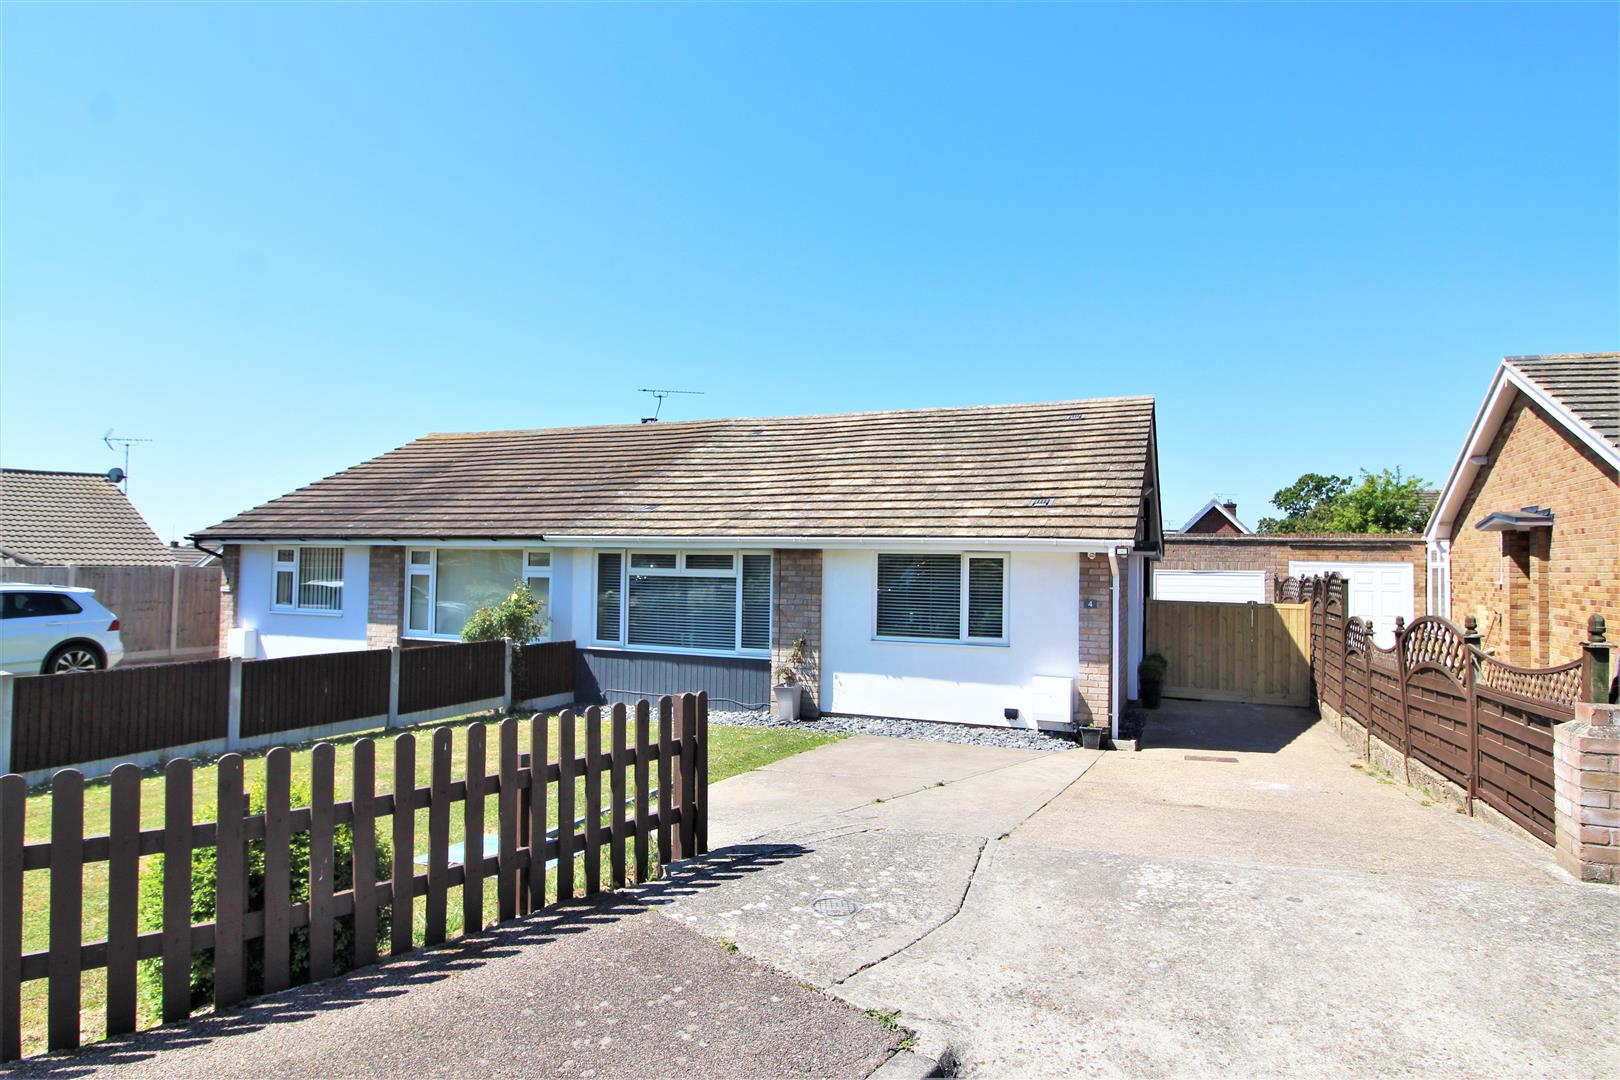 Cranford Close, Frinton-On-Sea, Essex, CO13 9LF